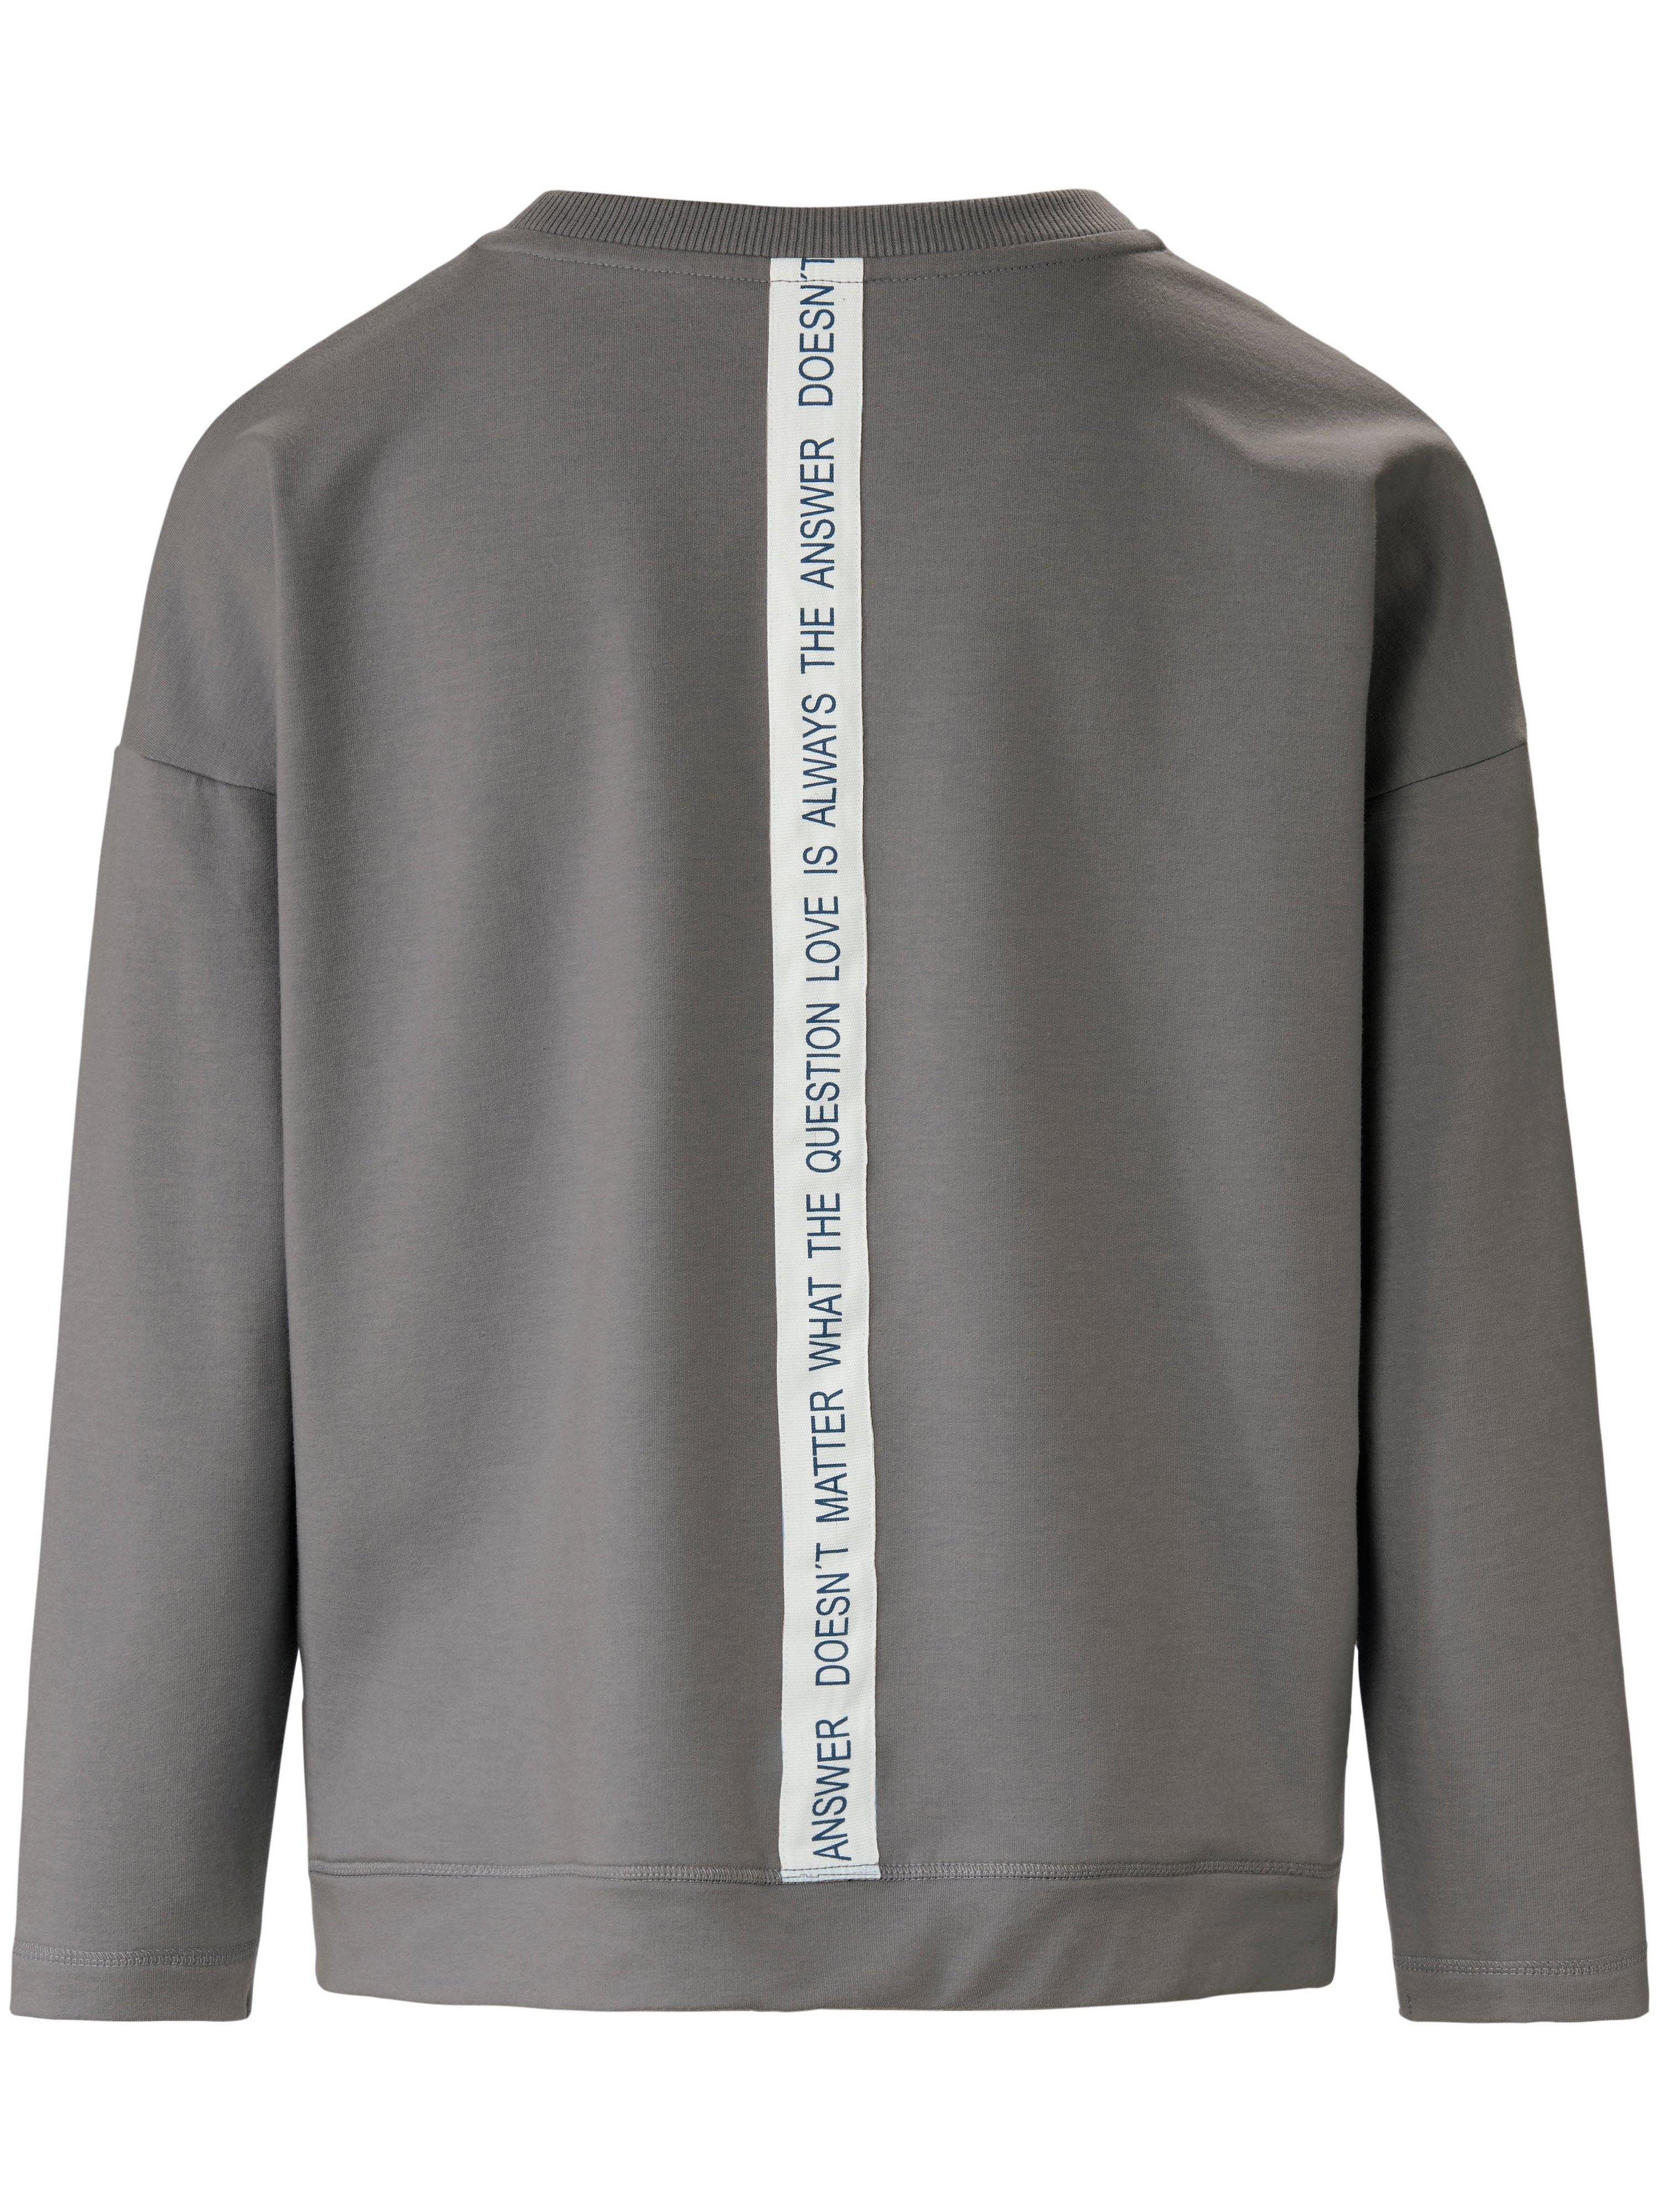 Sweatshirt lange ærmer Fra MYBC grøn